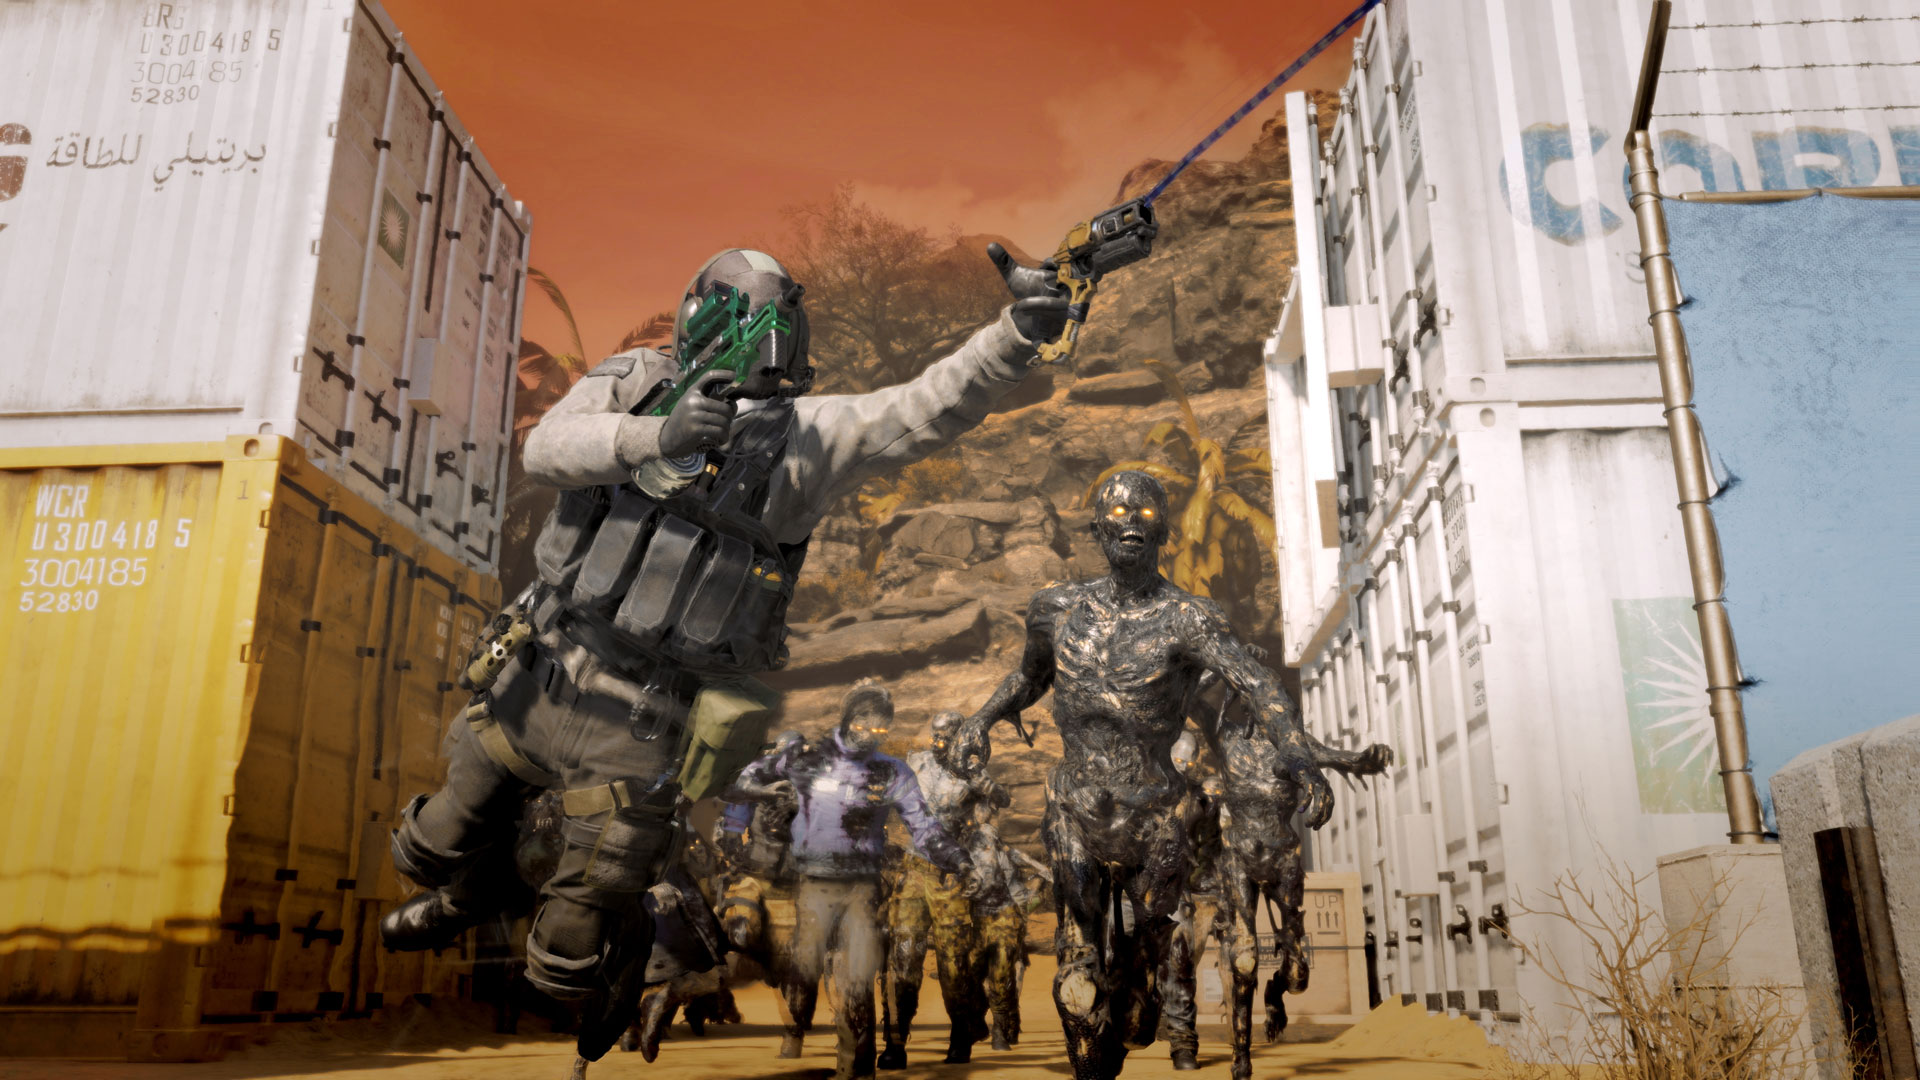 New Outbreak Crafting Item – Grapple Gun (Launch)